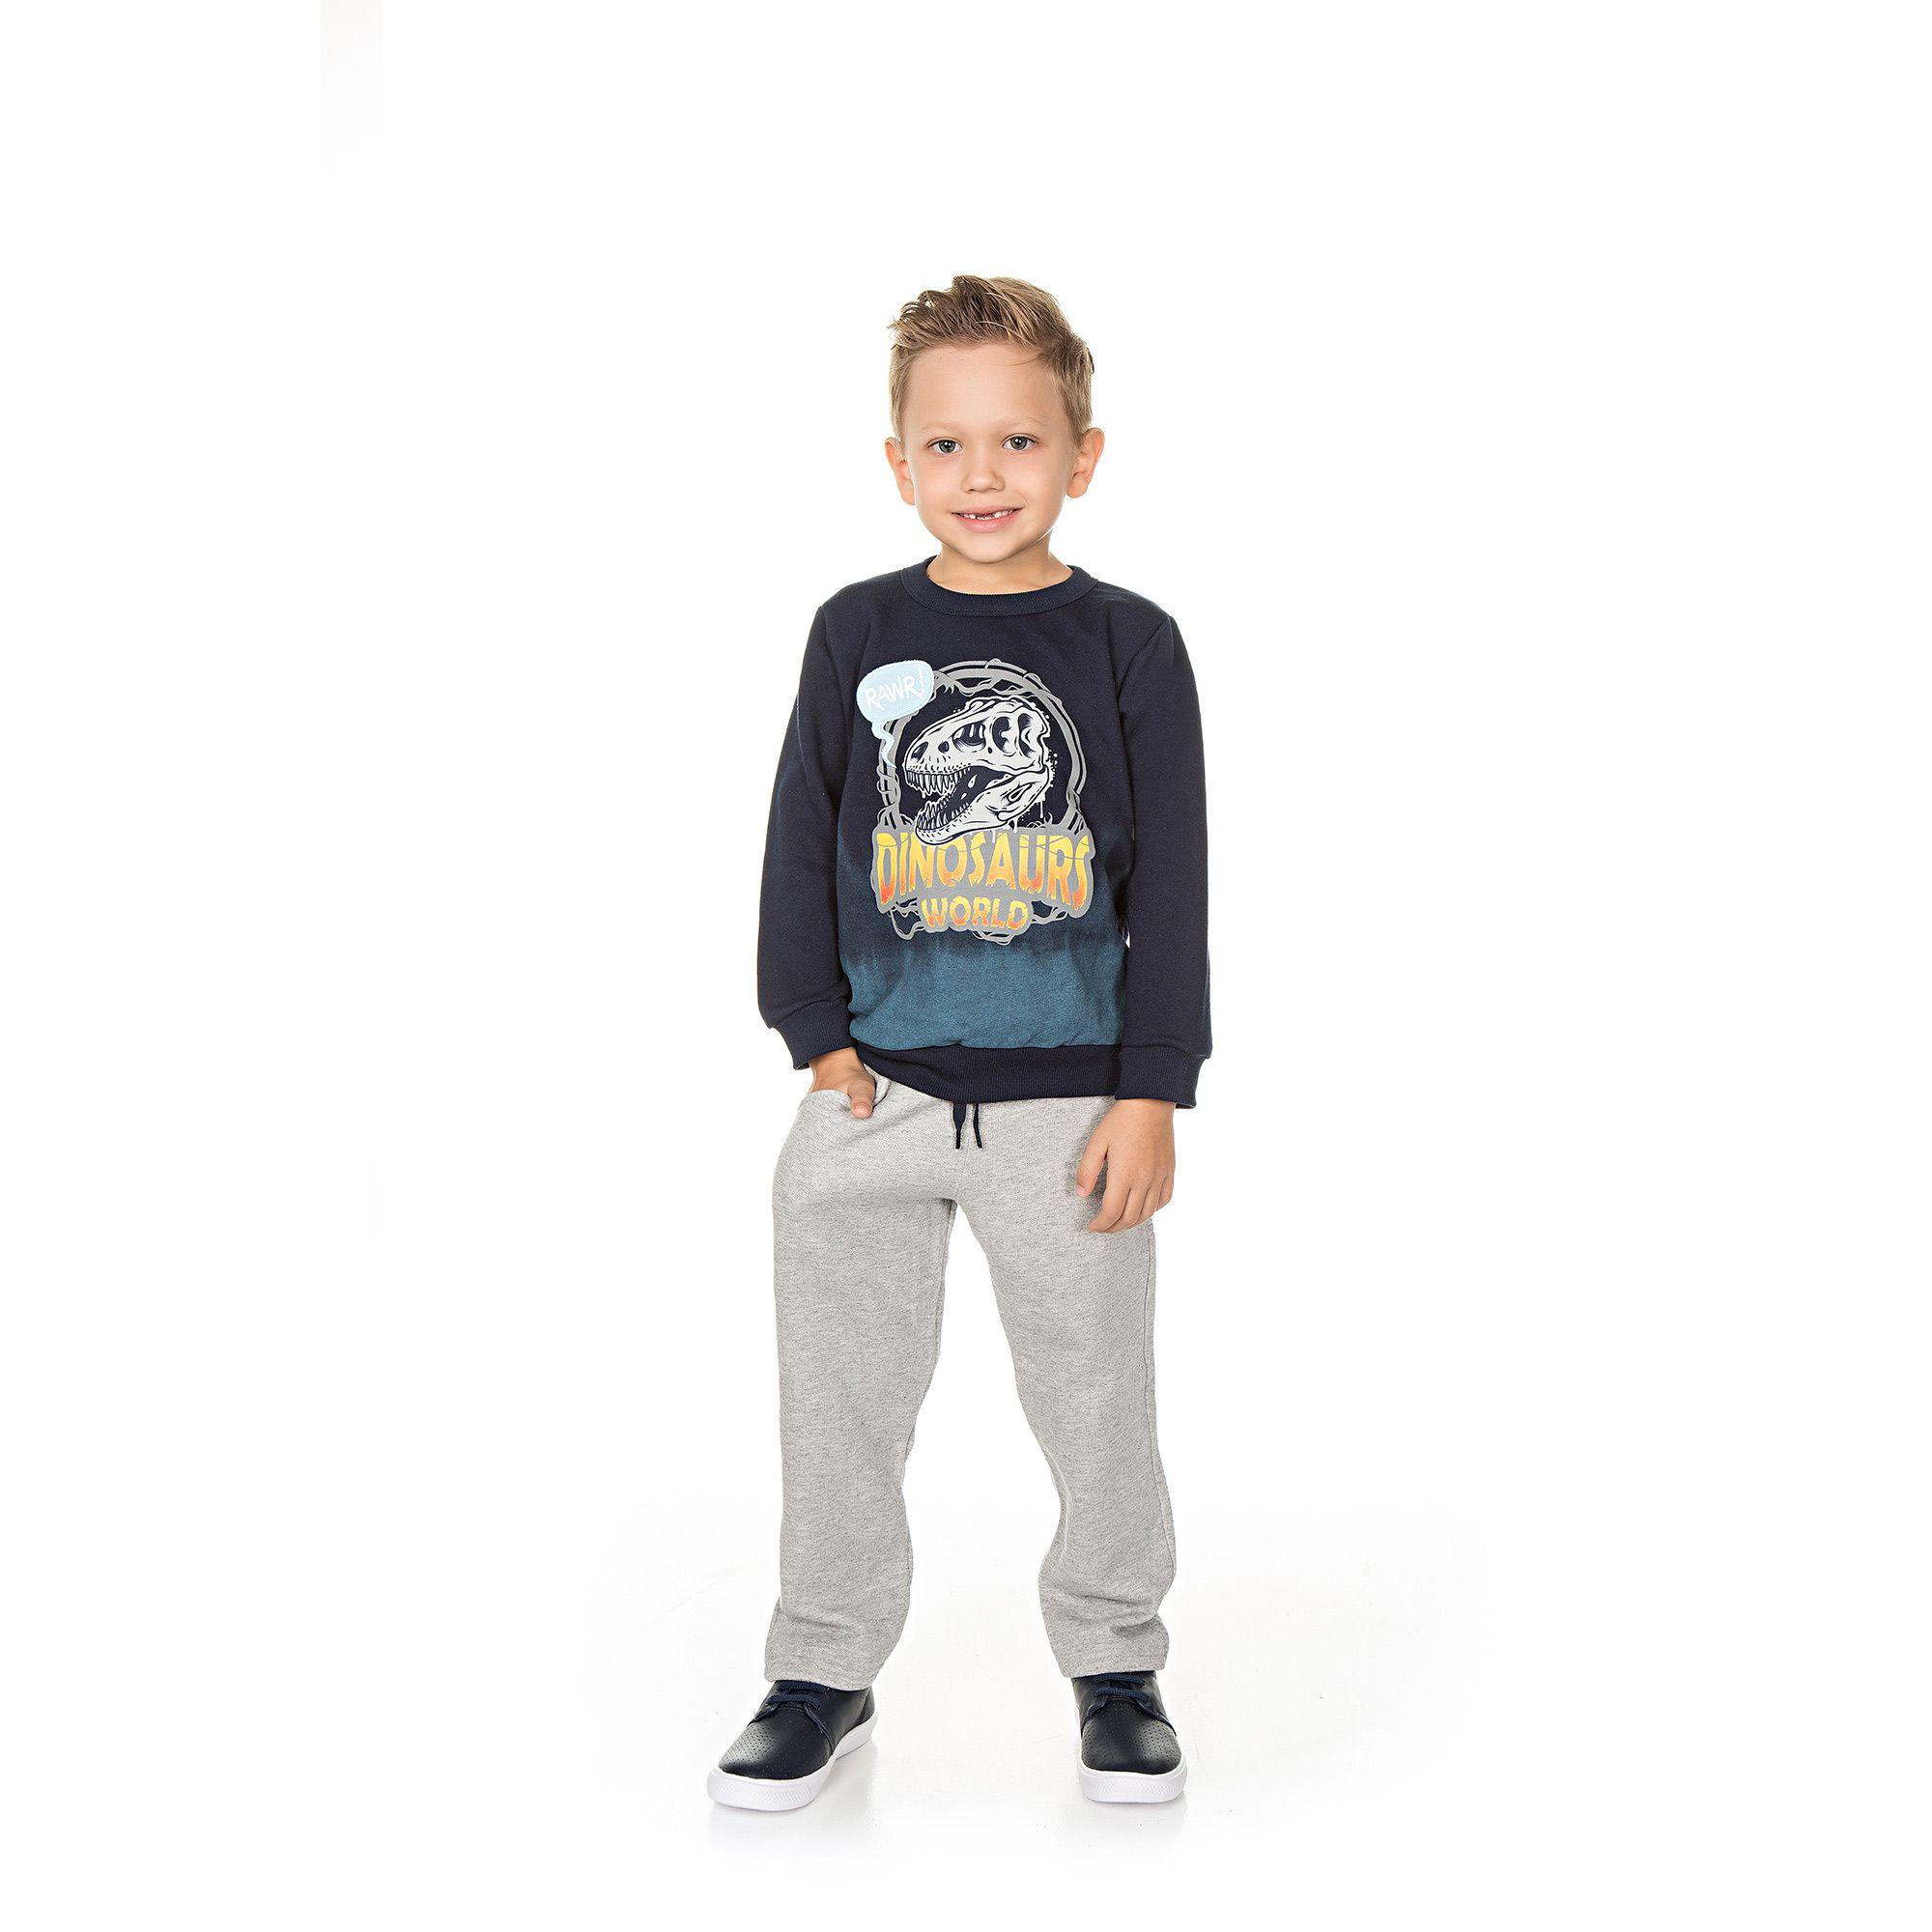 Conjunto Infantil Masculino  - Ref 5022 - Marinho/Mescla